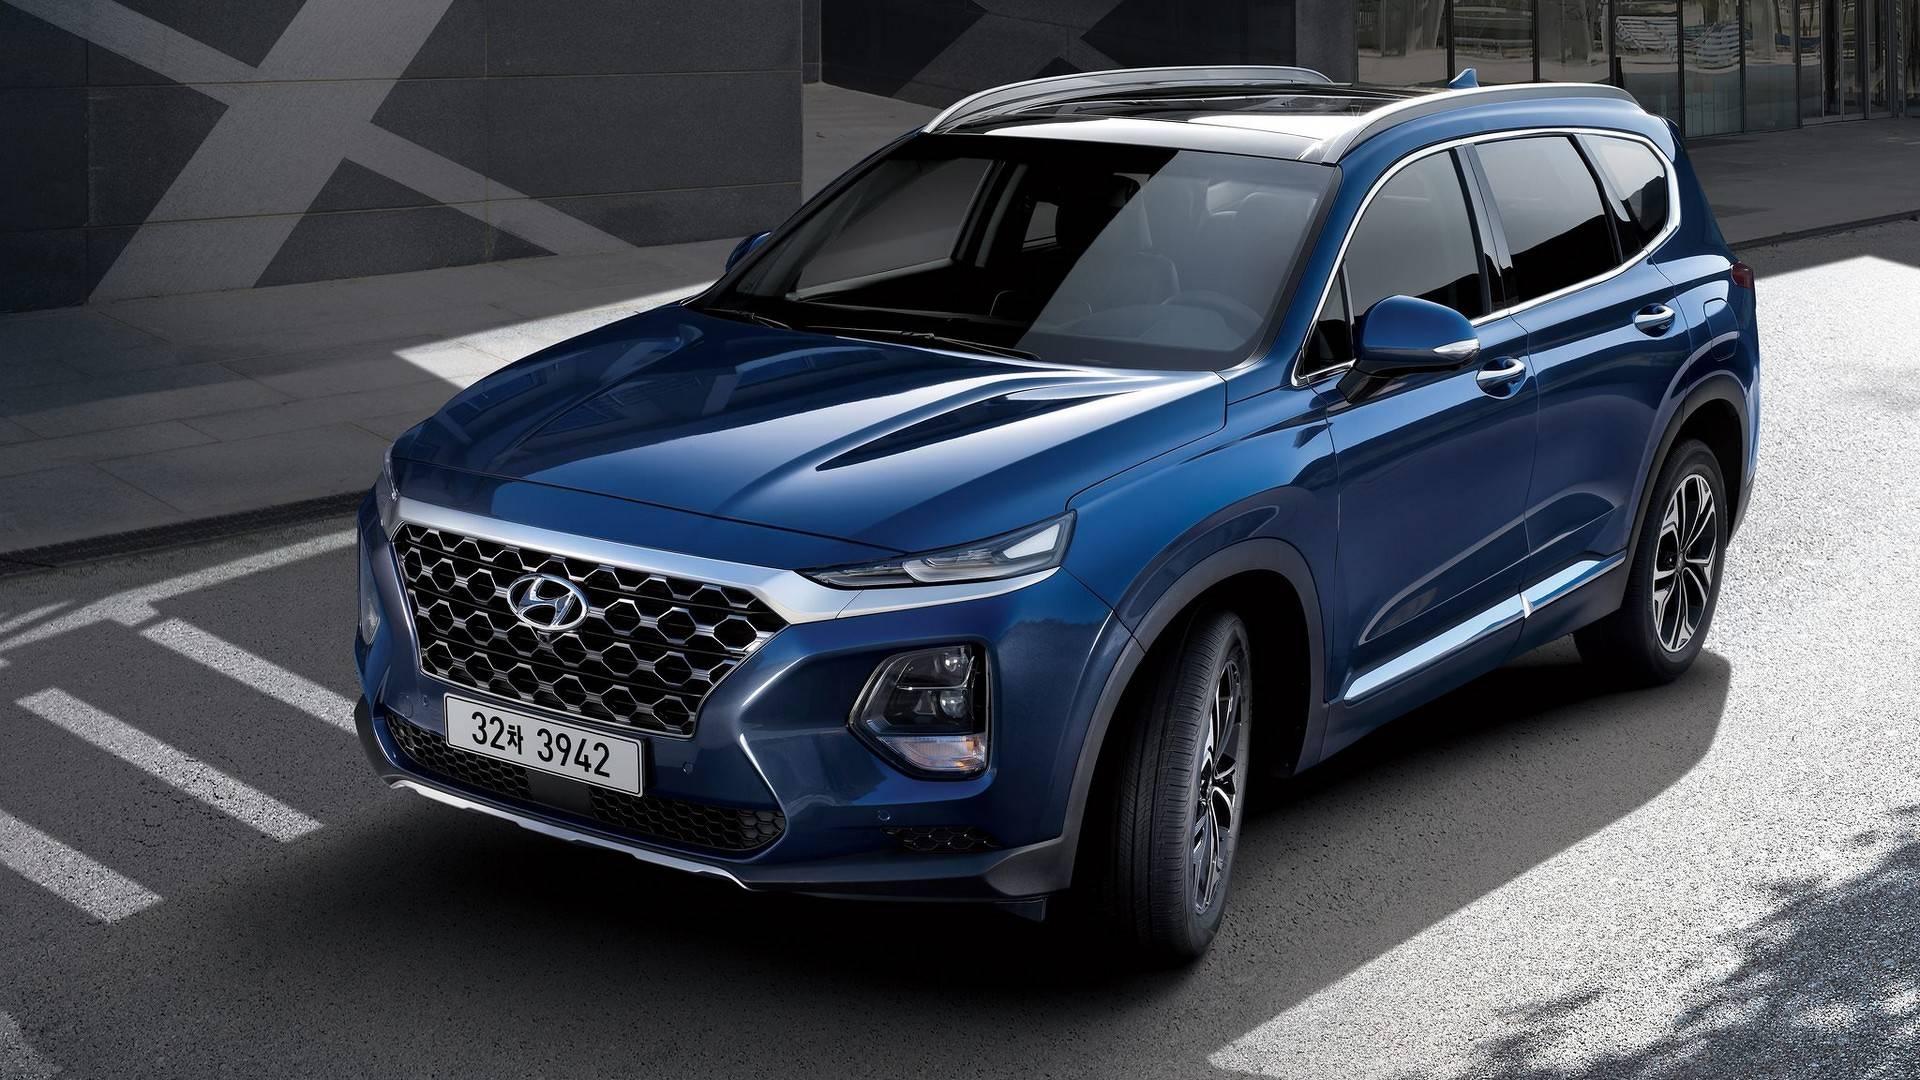 2019 Hyundai Santa Fe Priced From $25,500 - autoevolution